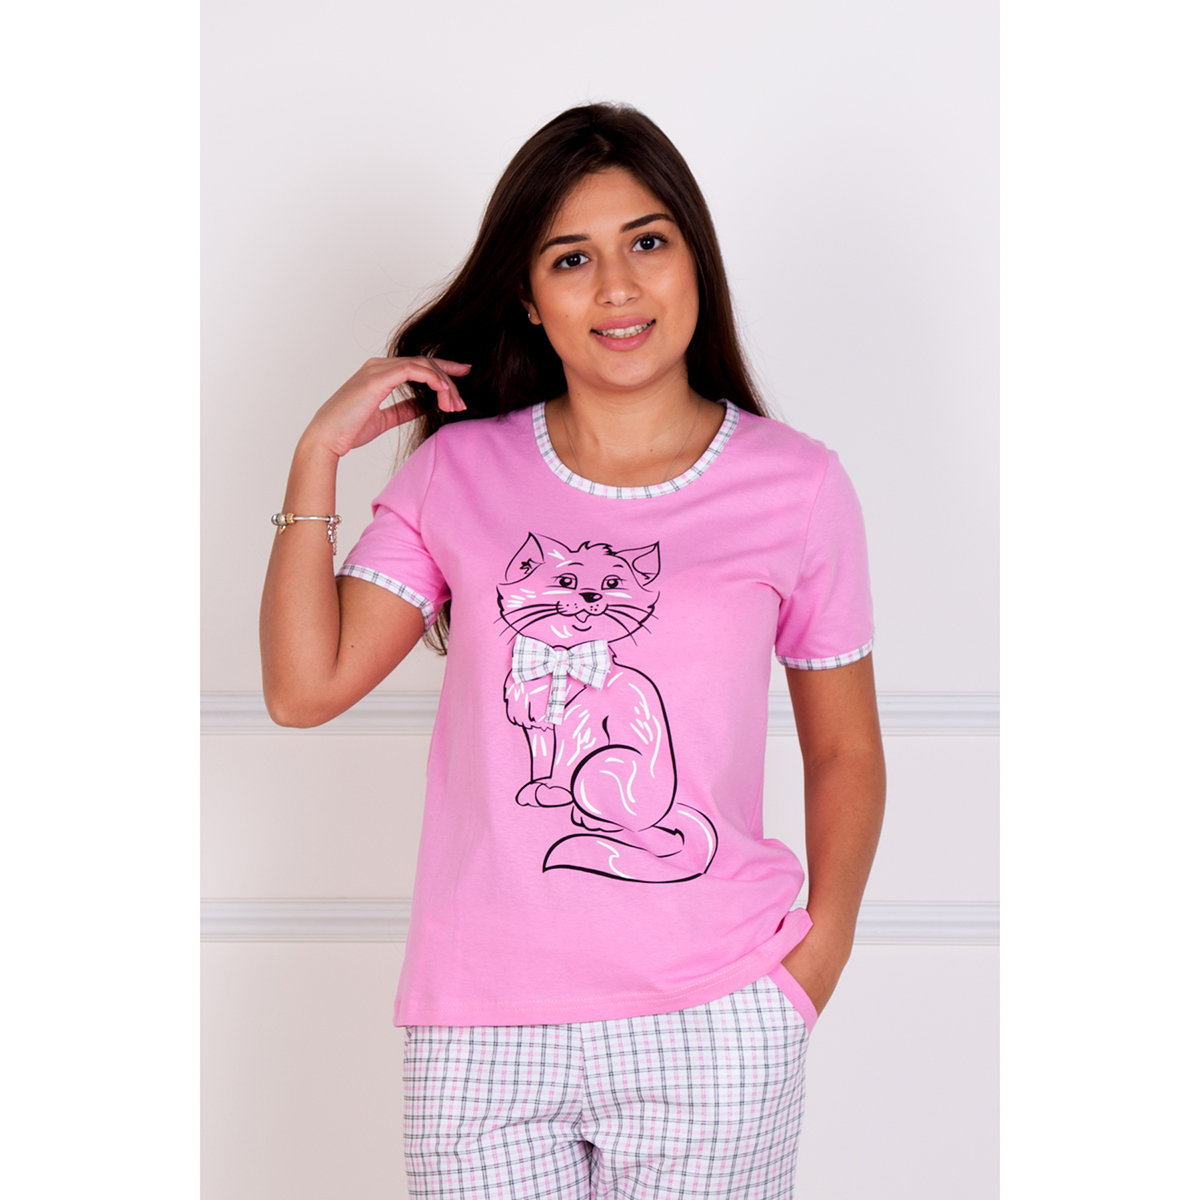 Женский пижама Киска Розовый, размер 50Пижамы<br>Обхват груди:100 см<br>Обхват талии:82 см<br>Обхват бедер:108 см<br>Рост:167 см<br><br>Тип: Жен. костюм<br>Размер: 50<br>Материал: Кулирка